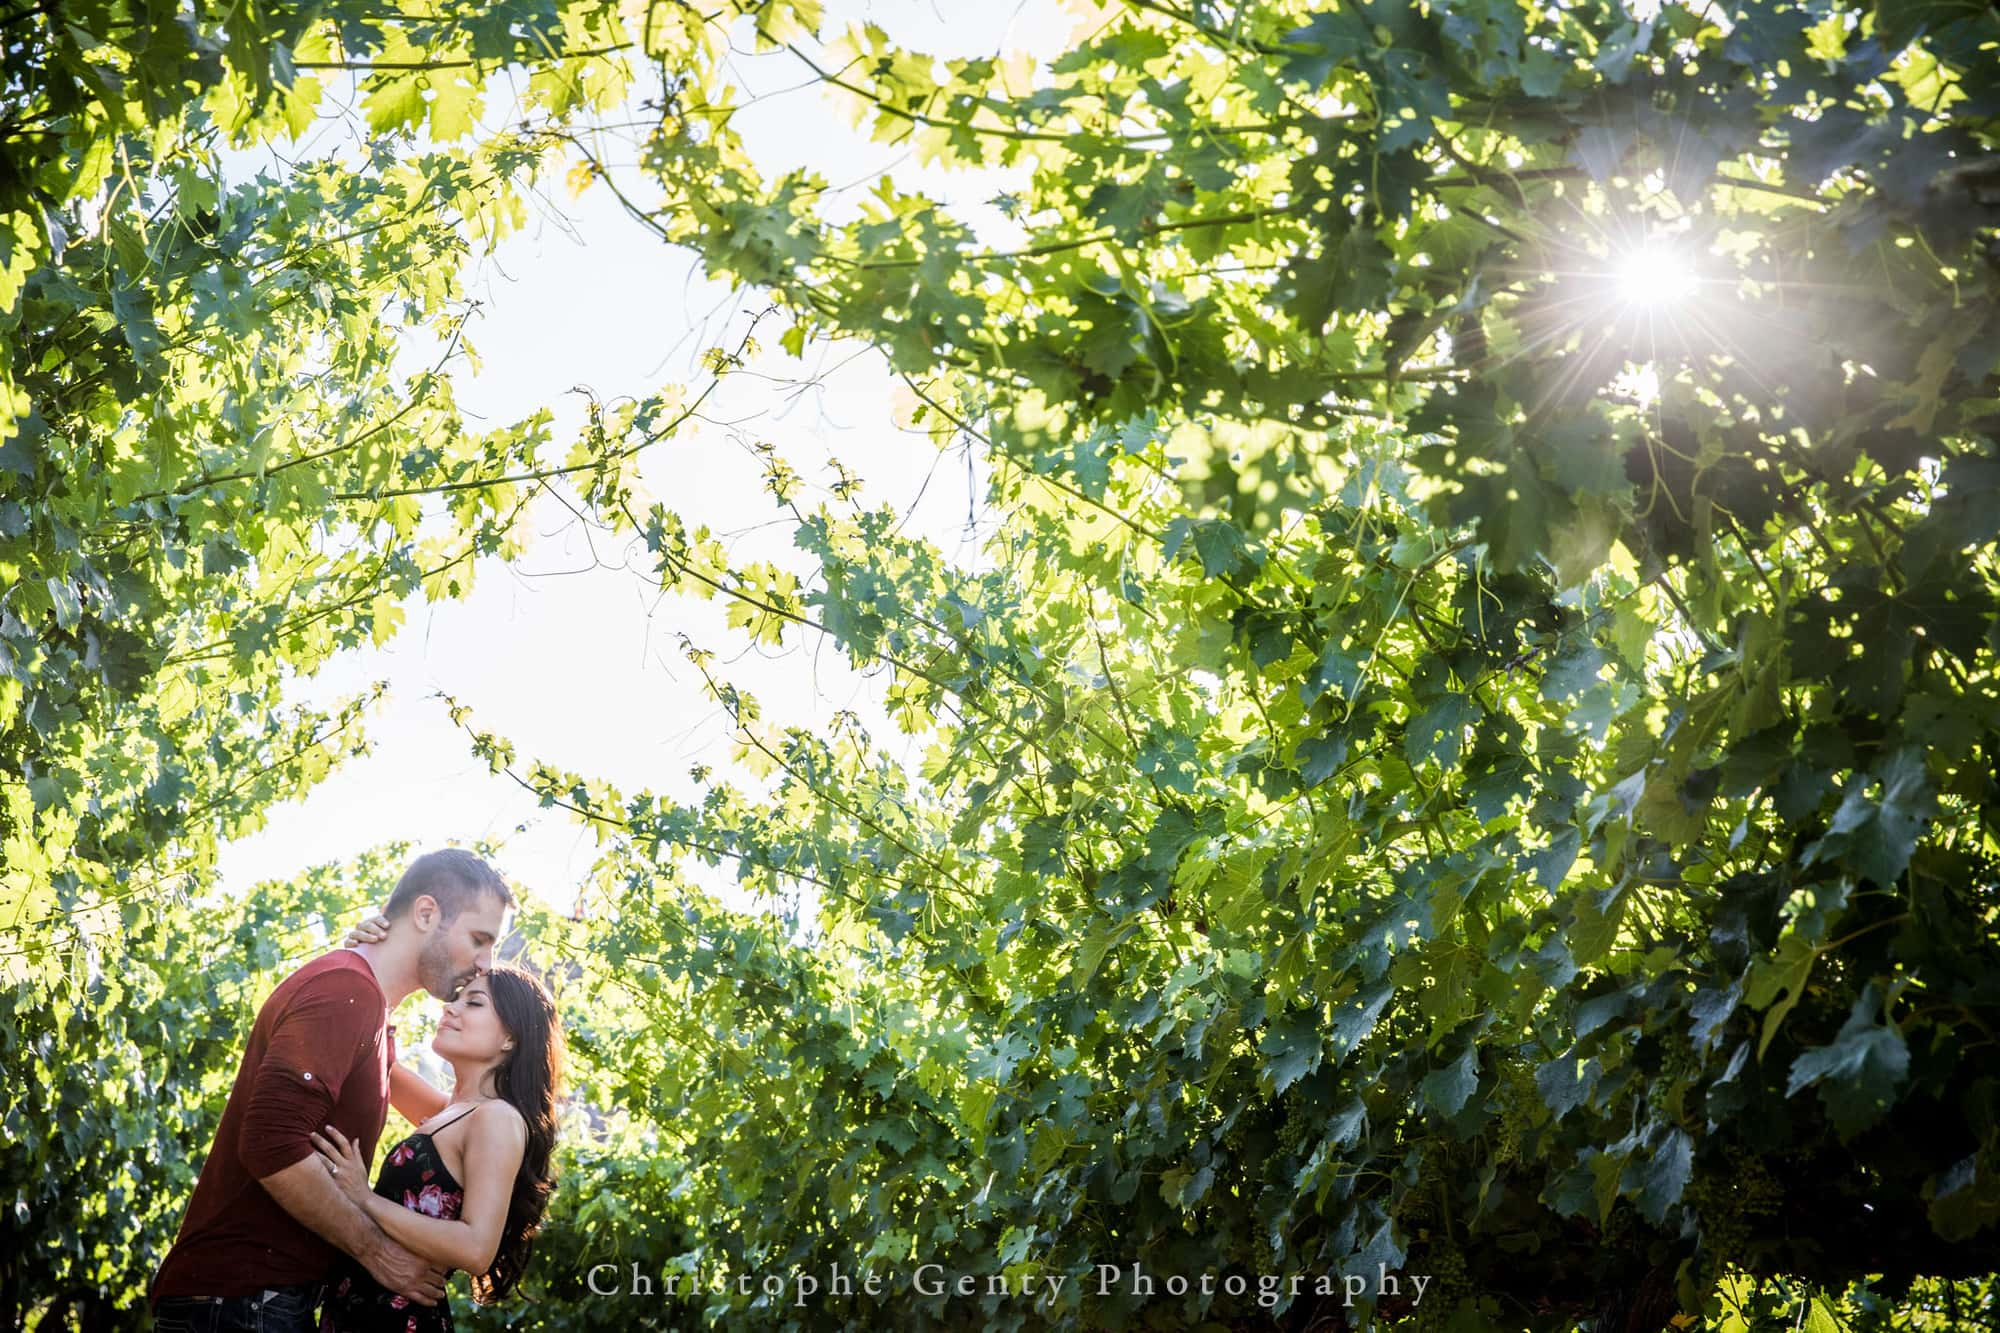 Castello di Amorosa Marriage Proposal Photography 335